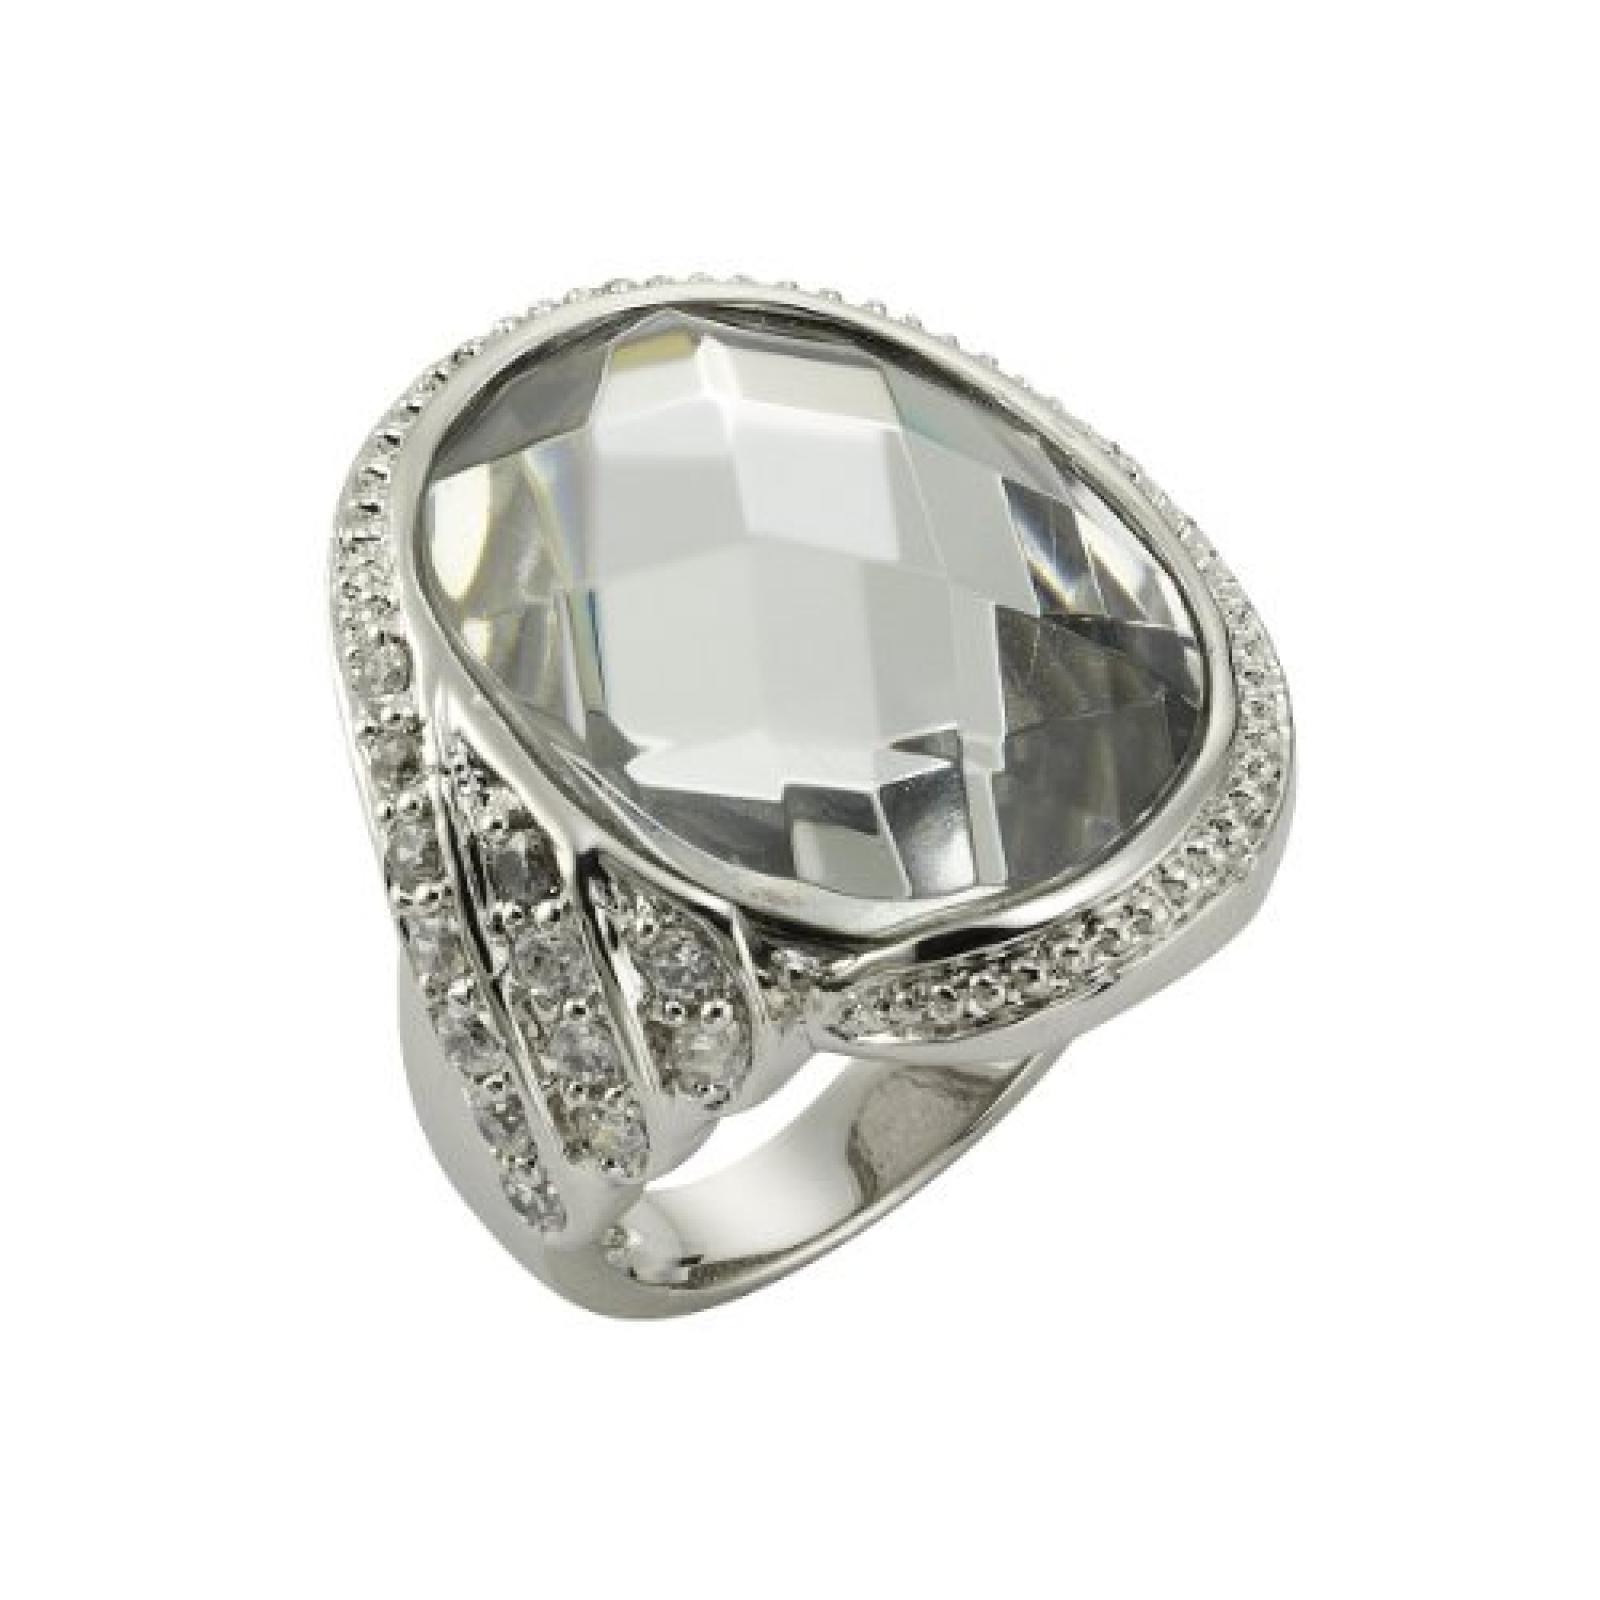 Celesta Damen-Ring Fashion Messing Kristall + Zirkonia weiß Gr. 53 (16.9) 360070400-017